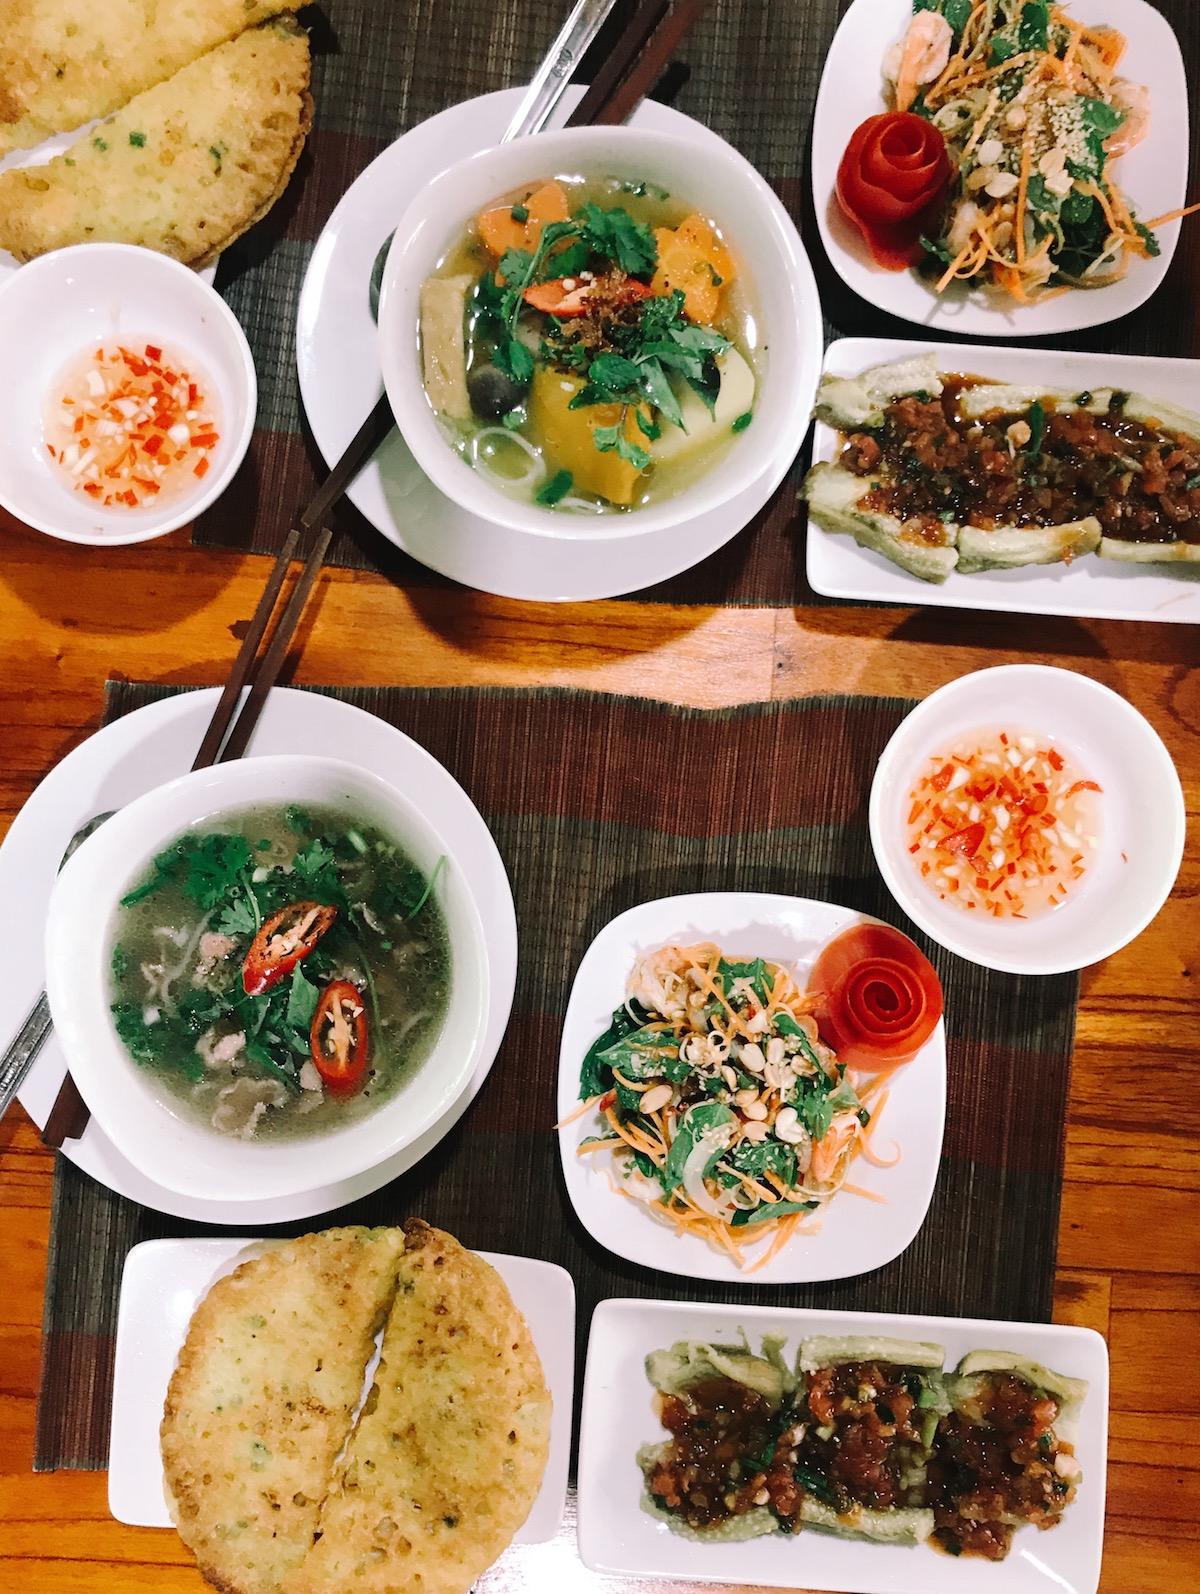 Hoi An Eco Cooking Class, Best of Food + Coffee in Da Nang + Hoi An, Vietnam | Ruby Josephine